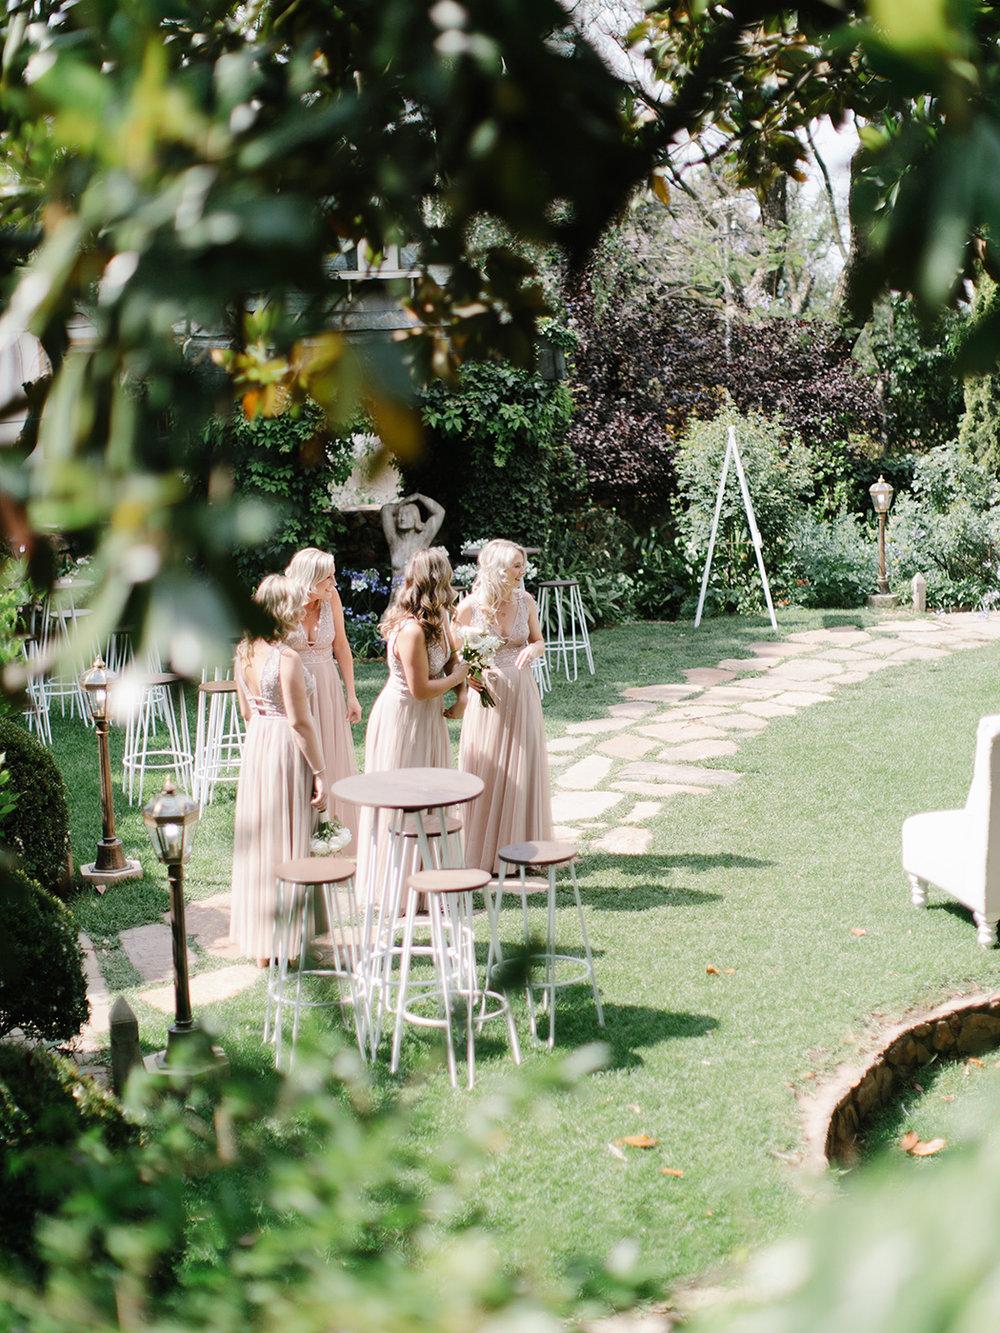 Bridesmaid Ceremony | Rensche Mari Photography